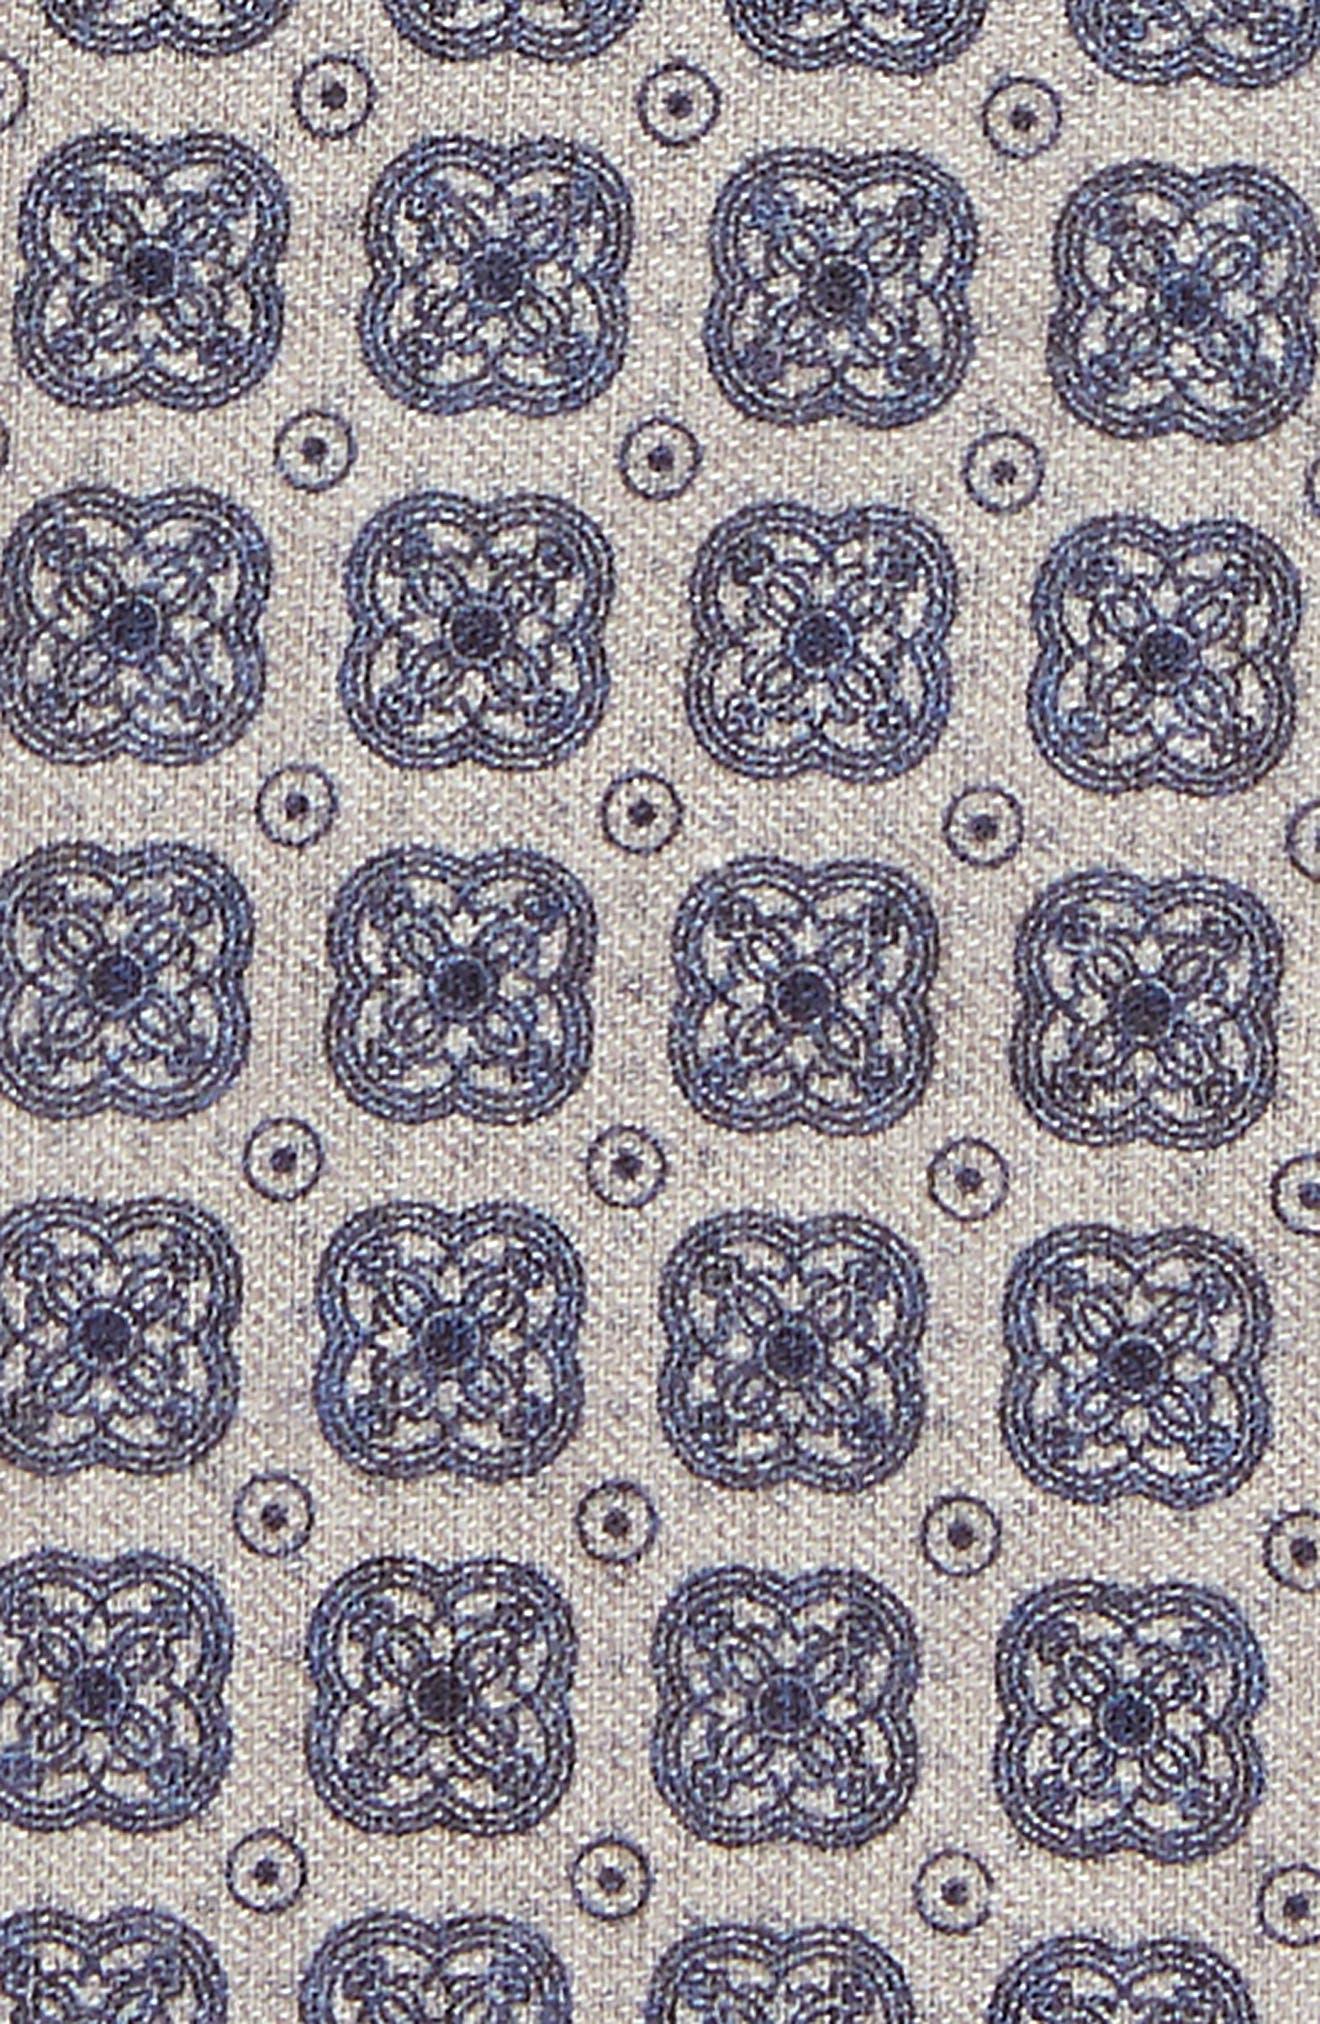 Medallion Wool & Cotton Pocket Square,                             Alternate thumbnail 3, color,                             021